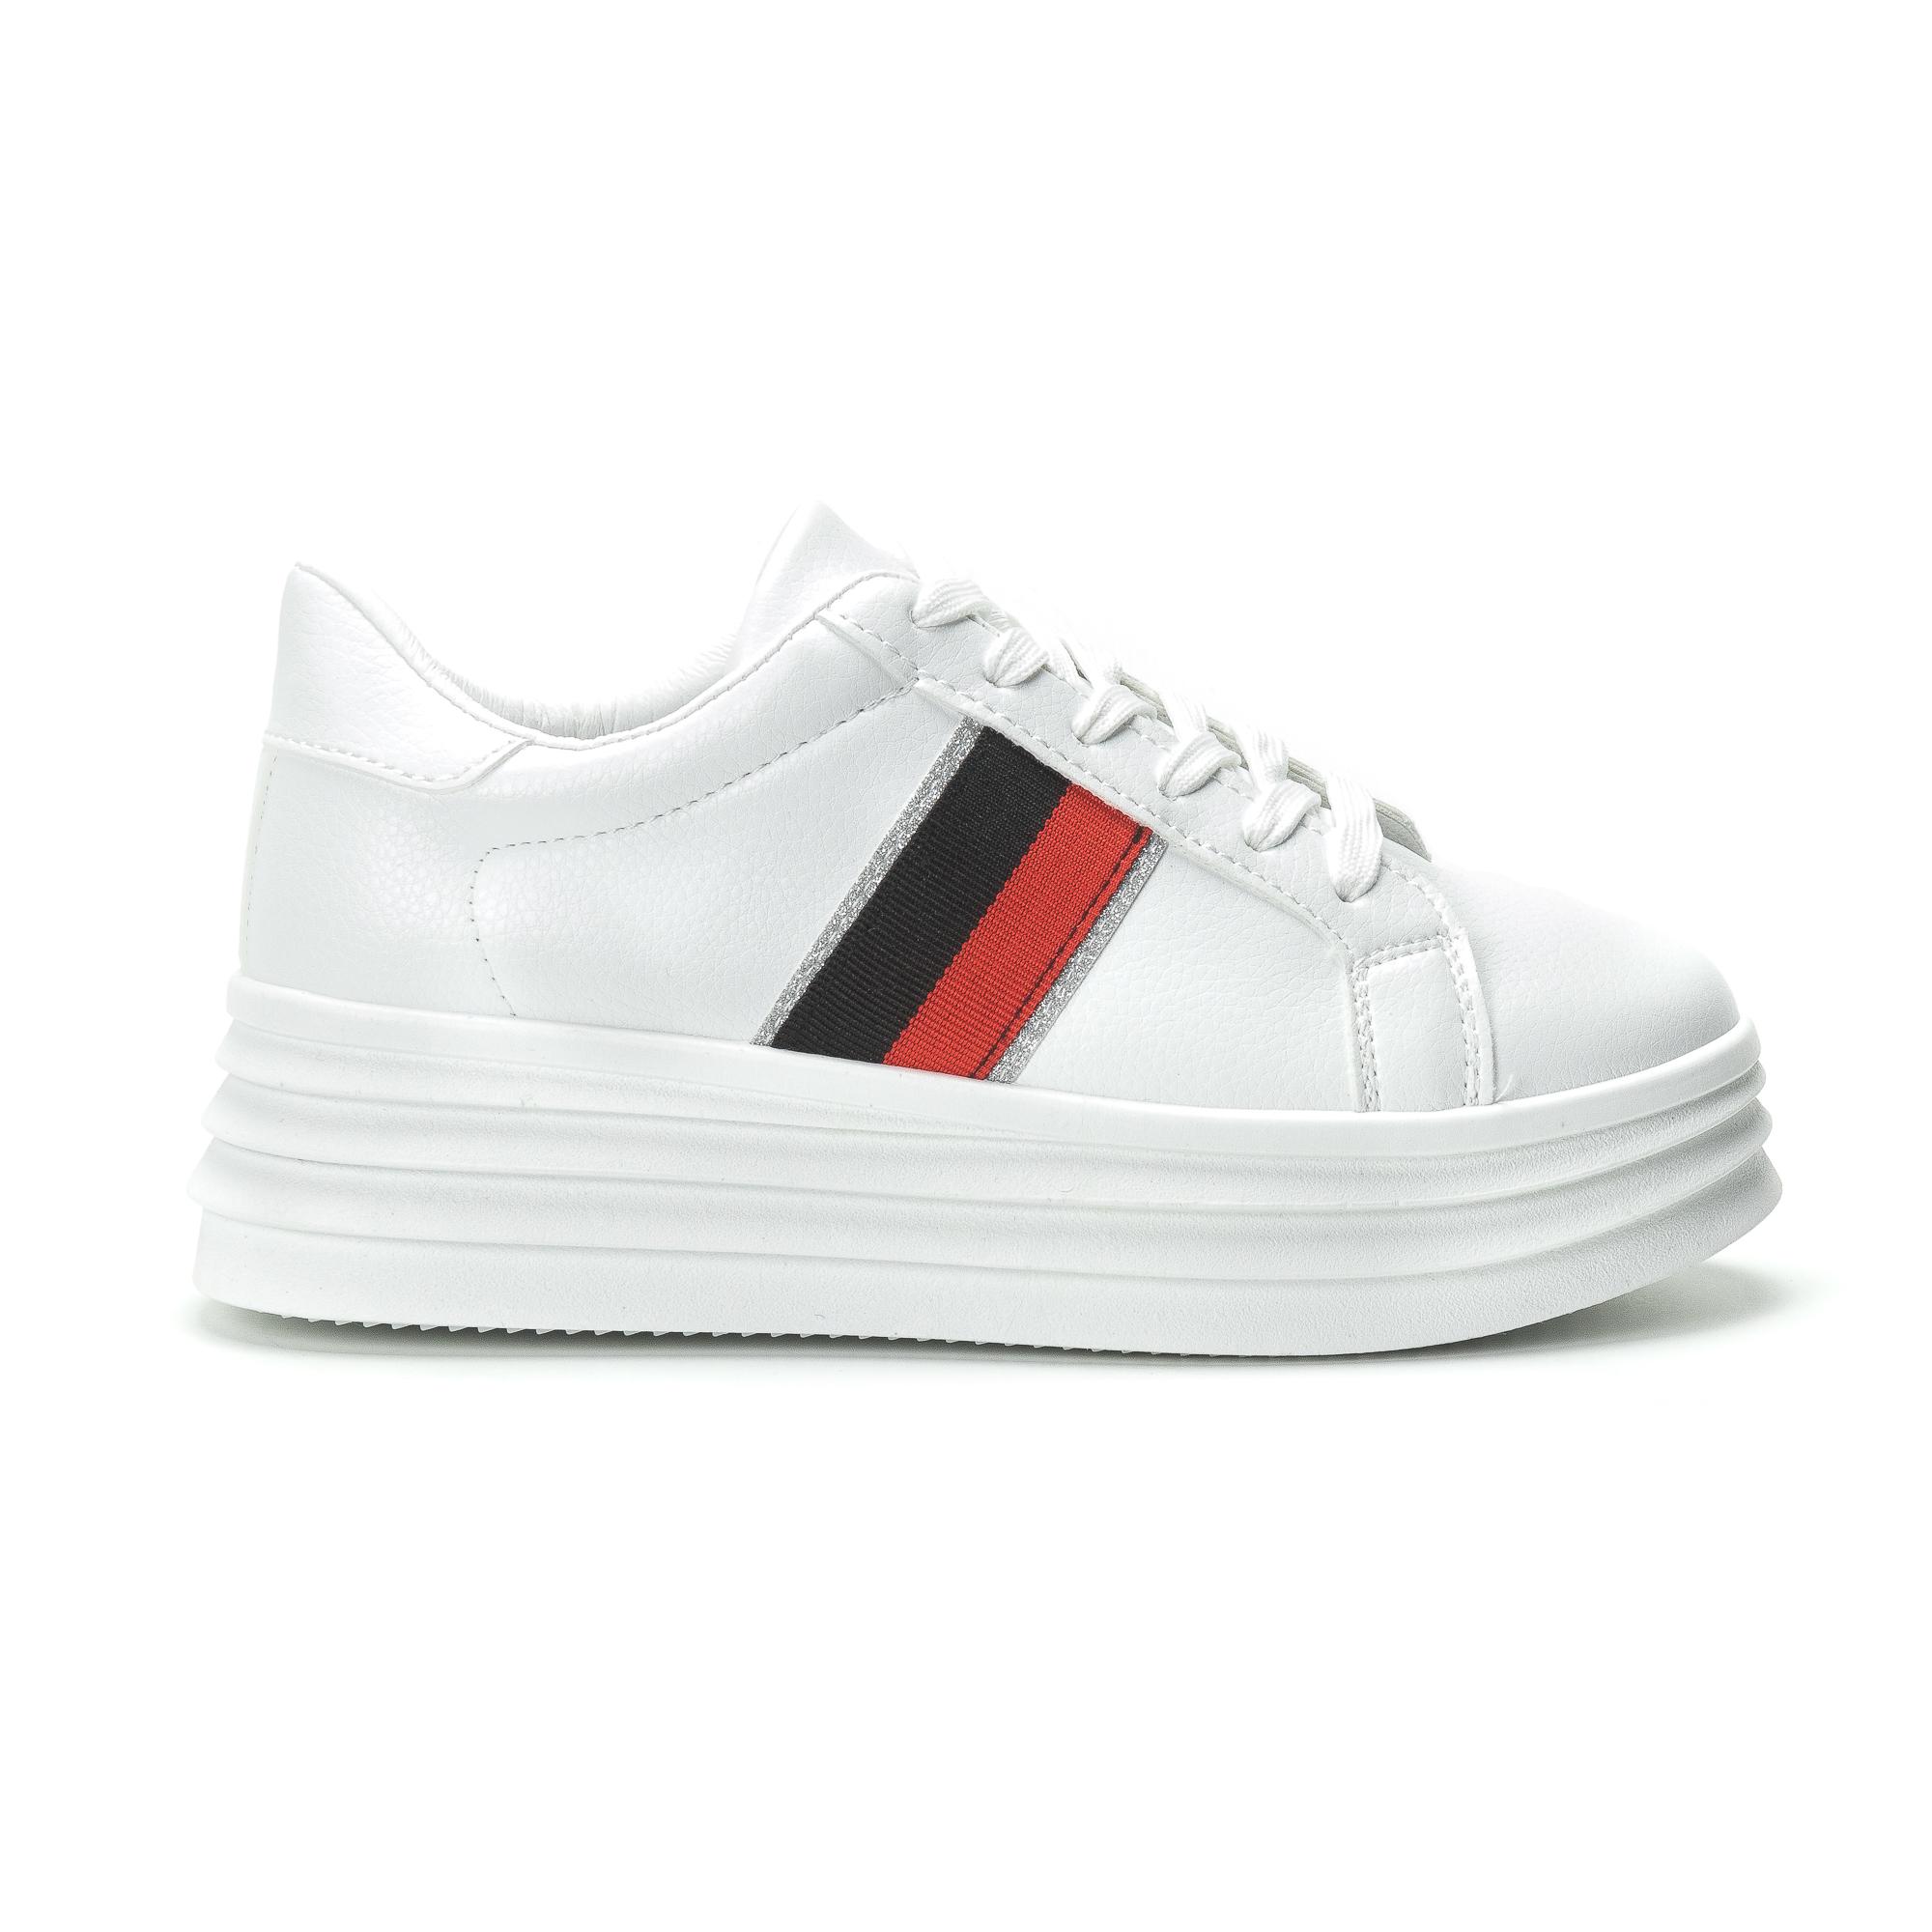 3f667272666 -20% Fashionmix Γυναικεία λευκά sneakers με διακοσμητική λεπτομέρεια